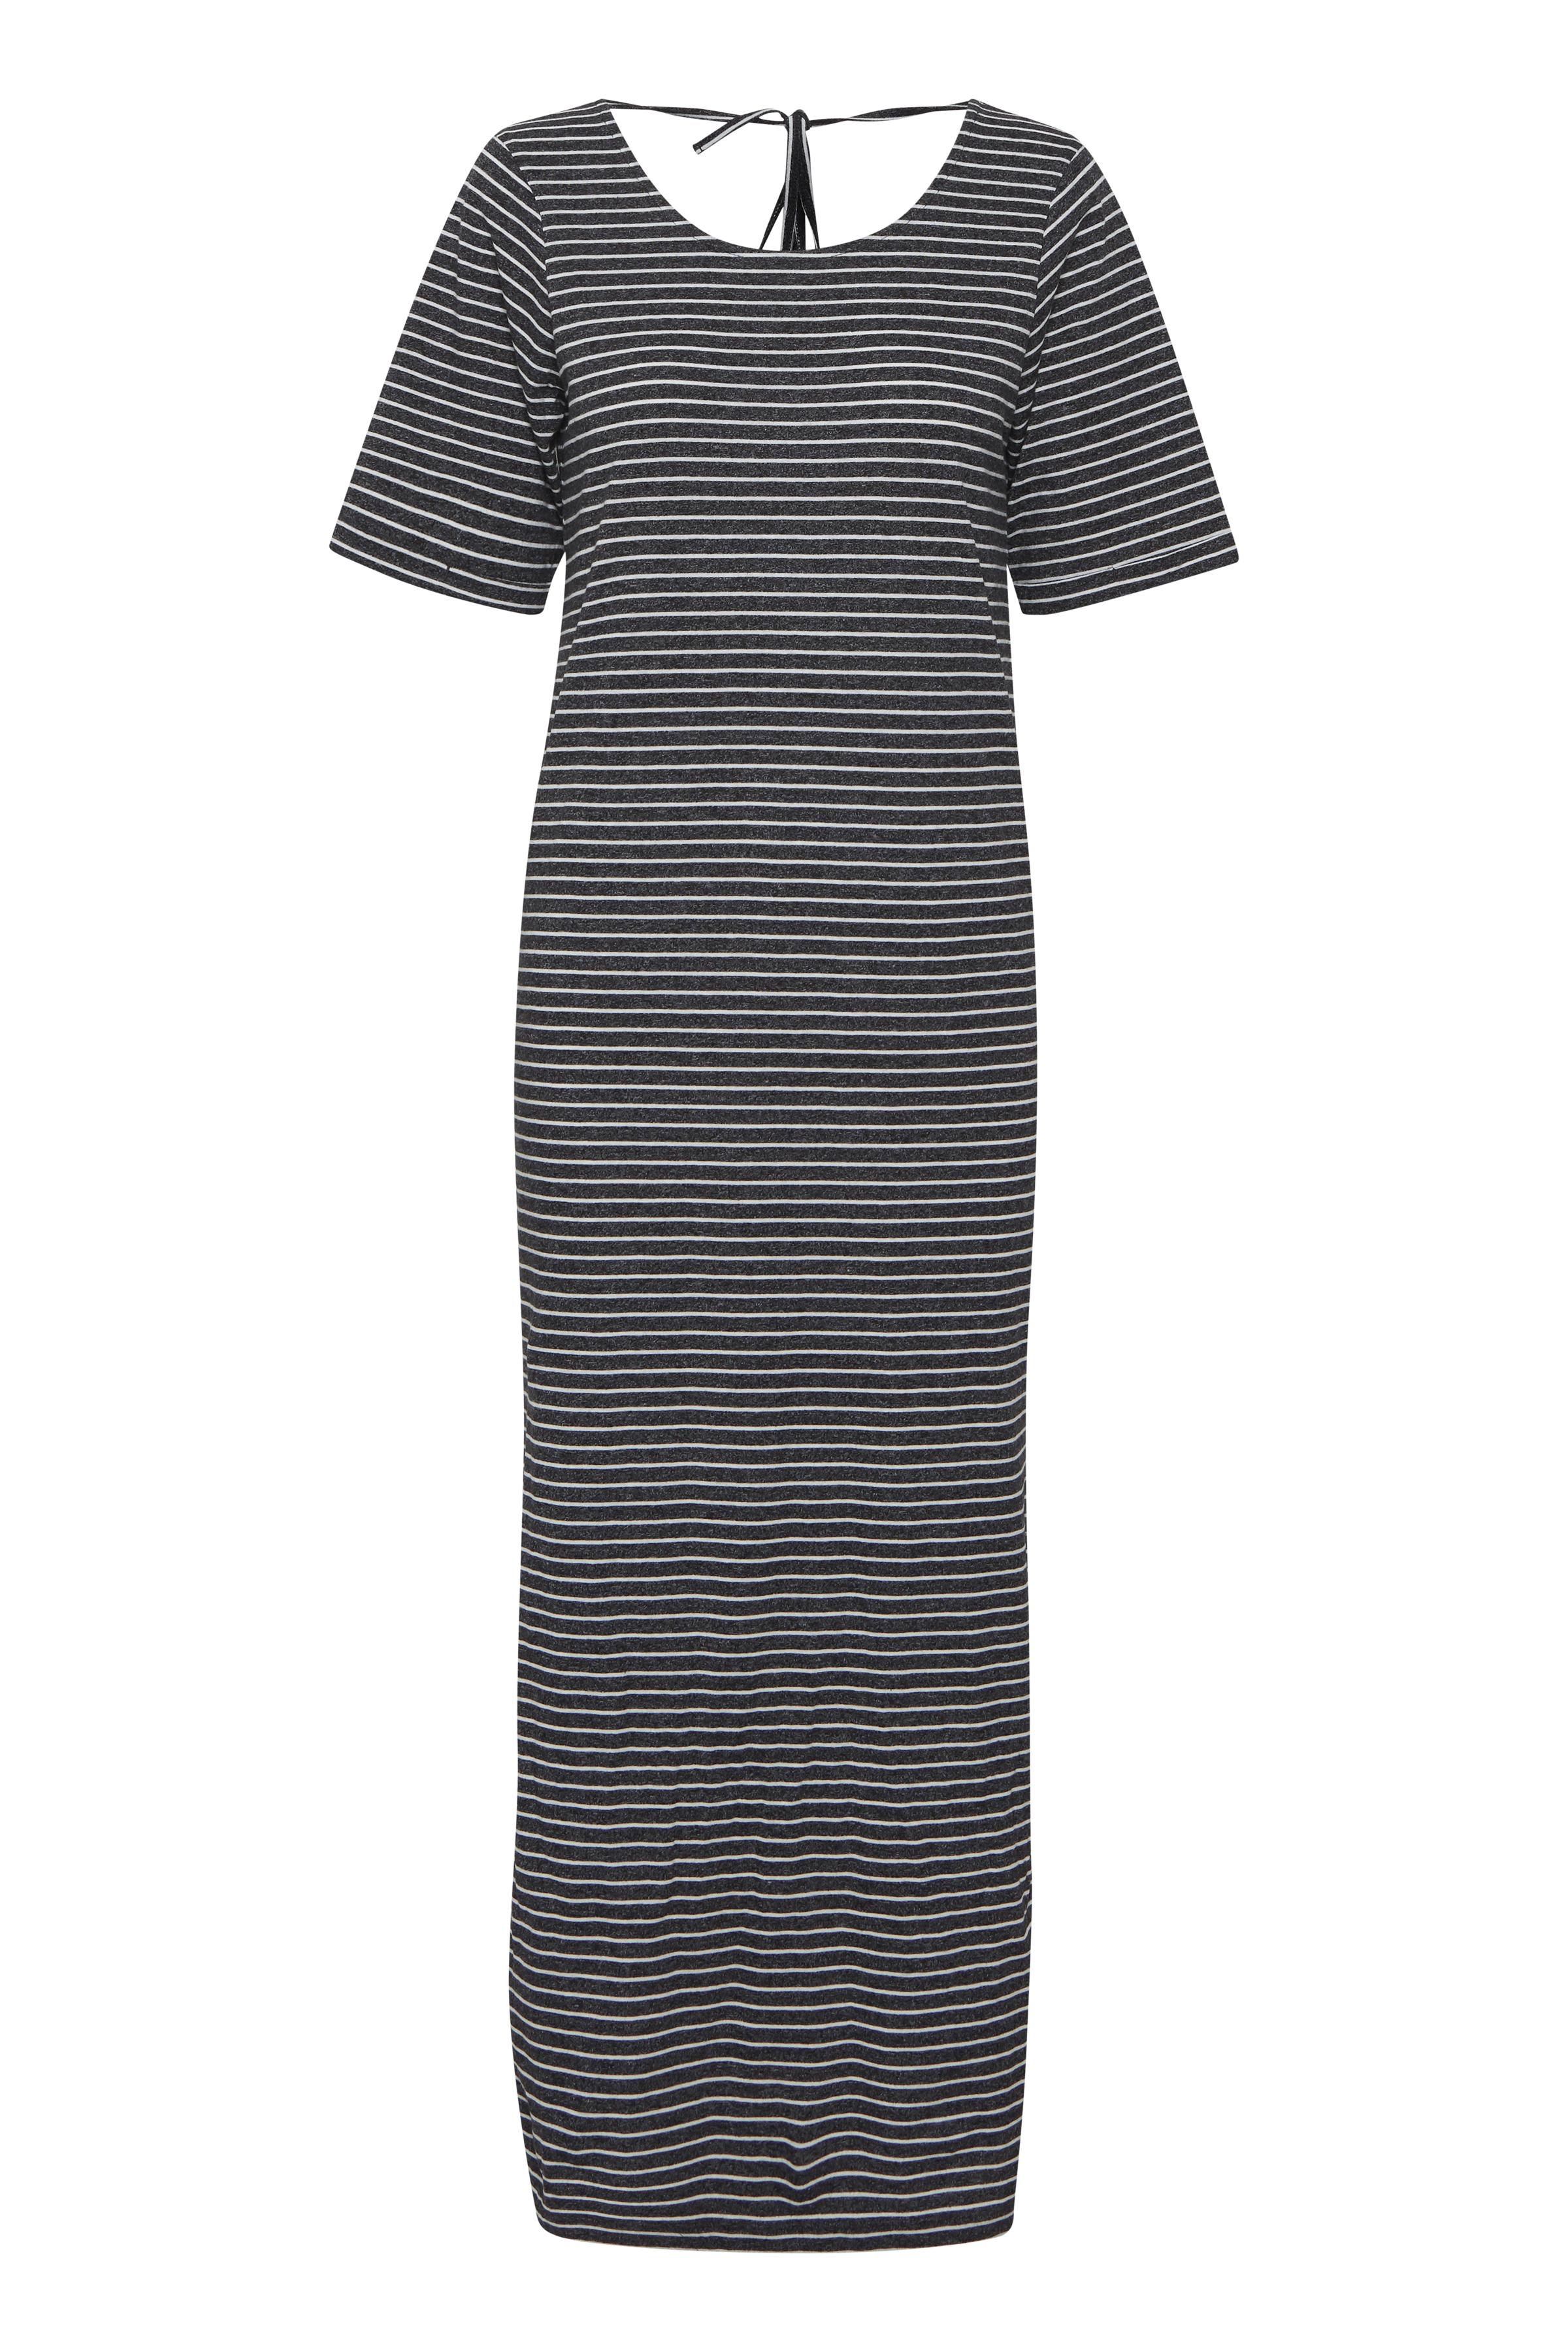 Ichi Dame Jerseykjole - Small Stripe Black